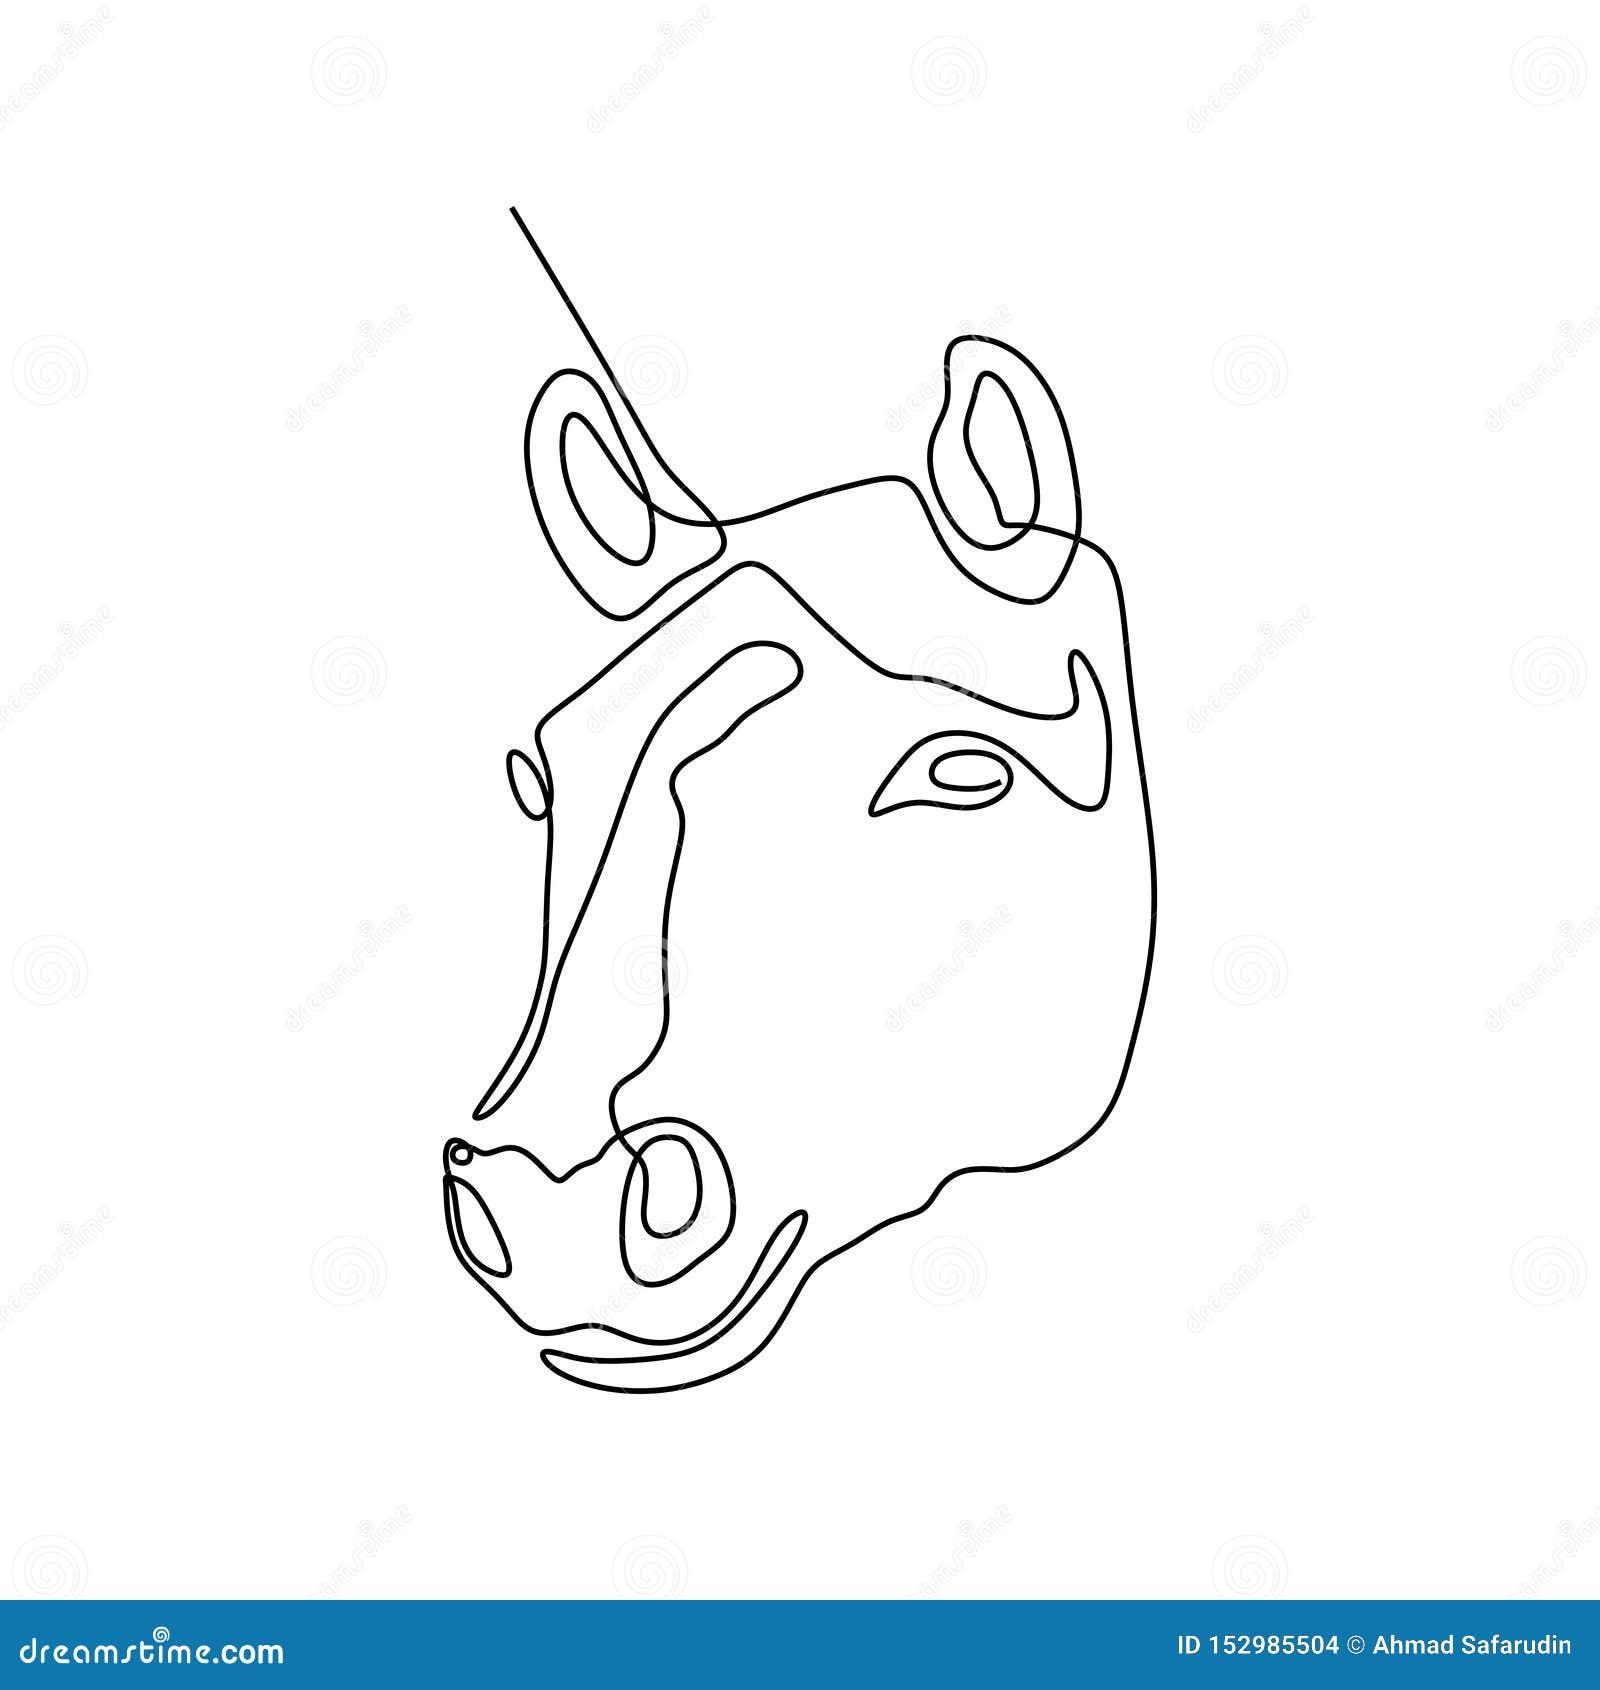 Continuous One Line Horse Head Minimalist Design Vector Illustration Minimalism Style Stock Vector Illustration Of Drawn Animals 152985504